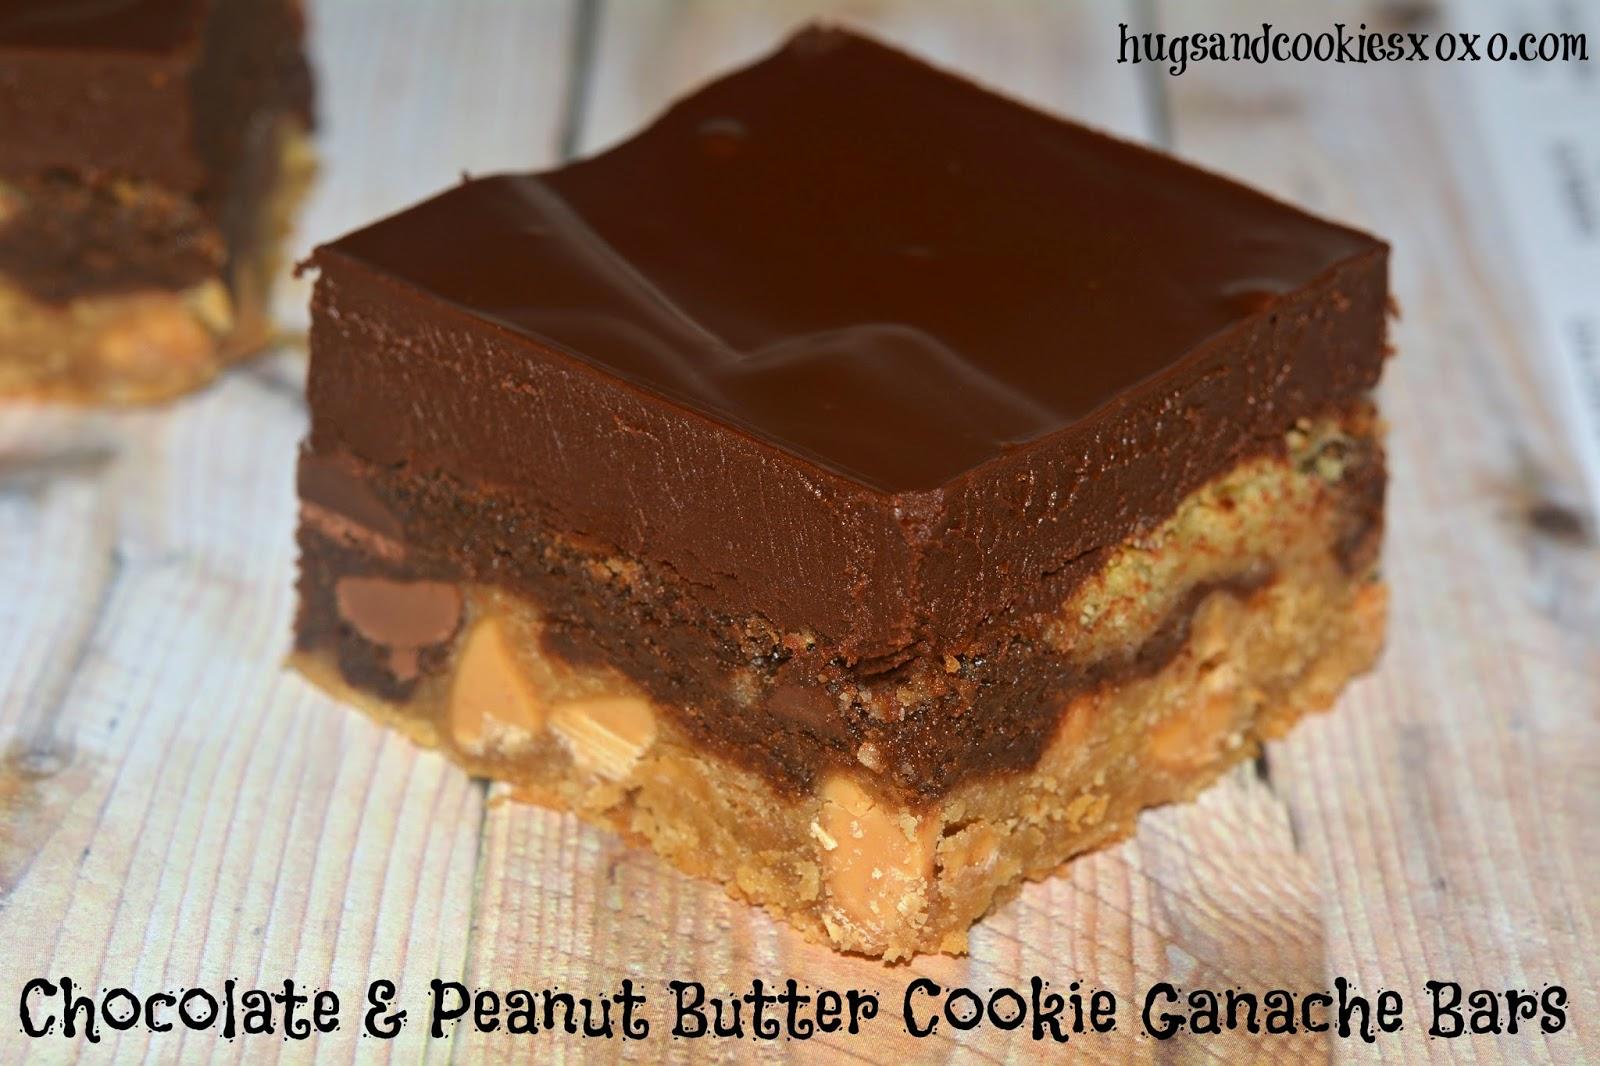 chocolate & peanut butter ganache cookies bars